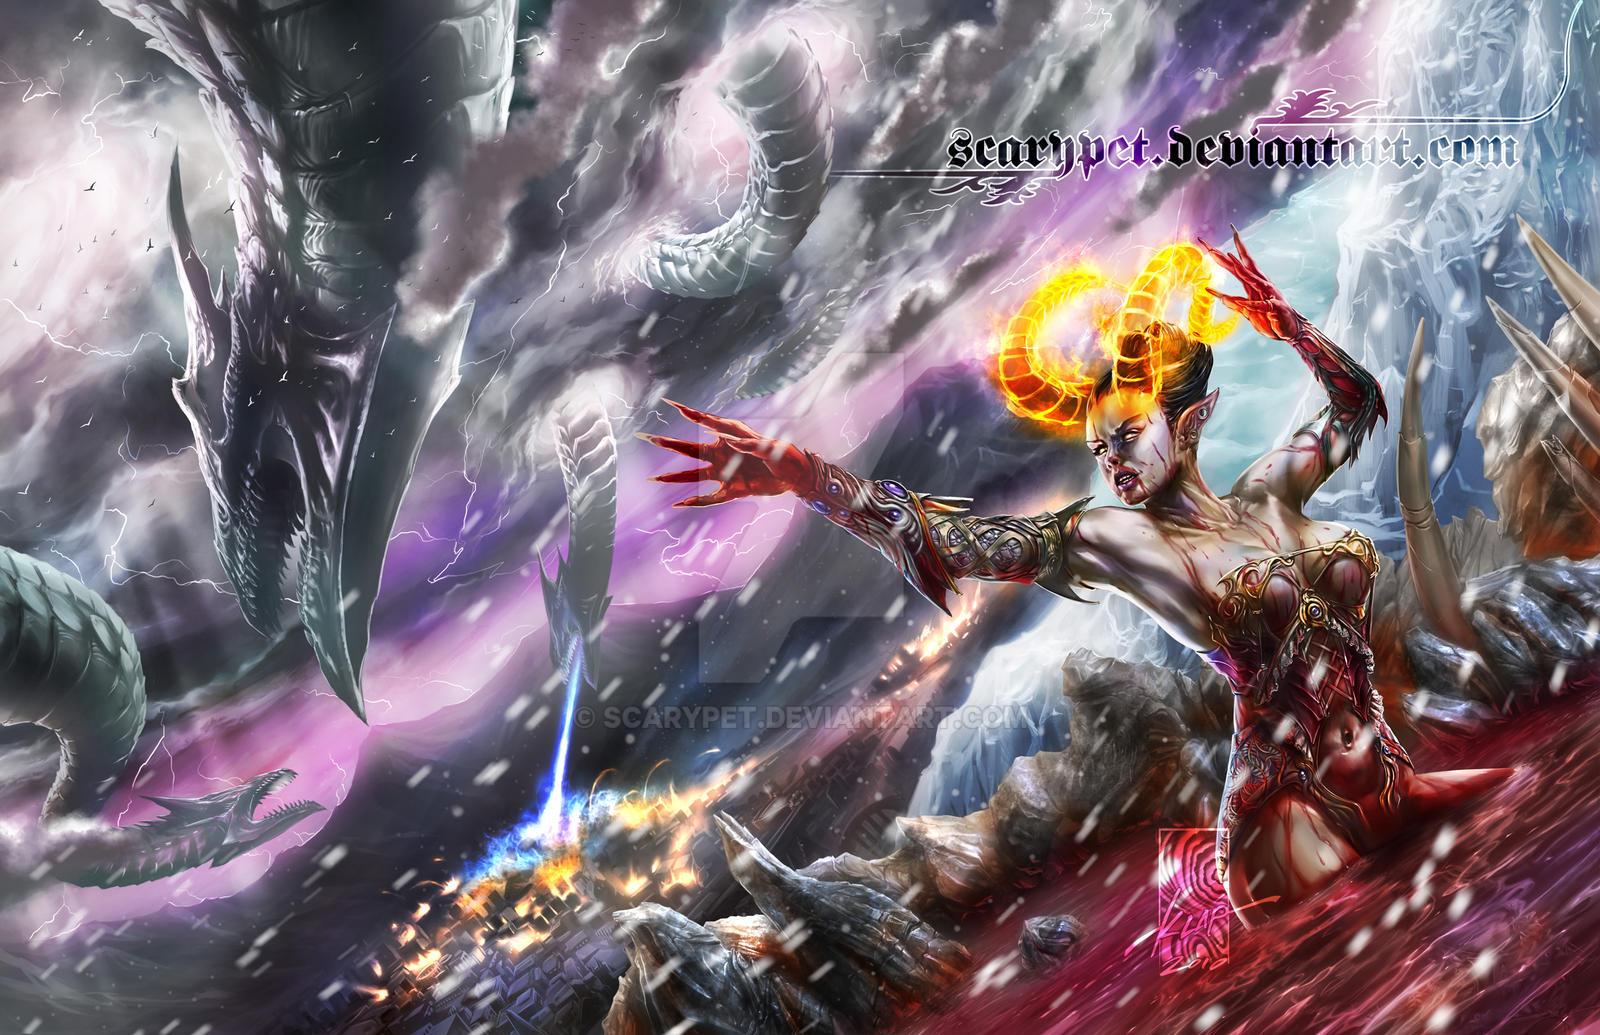 Bathory, Blood Summoner by scarypet